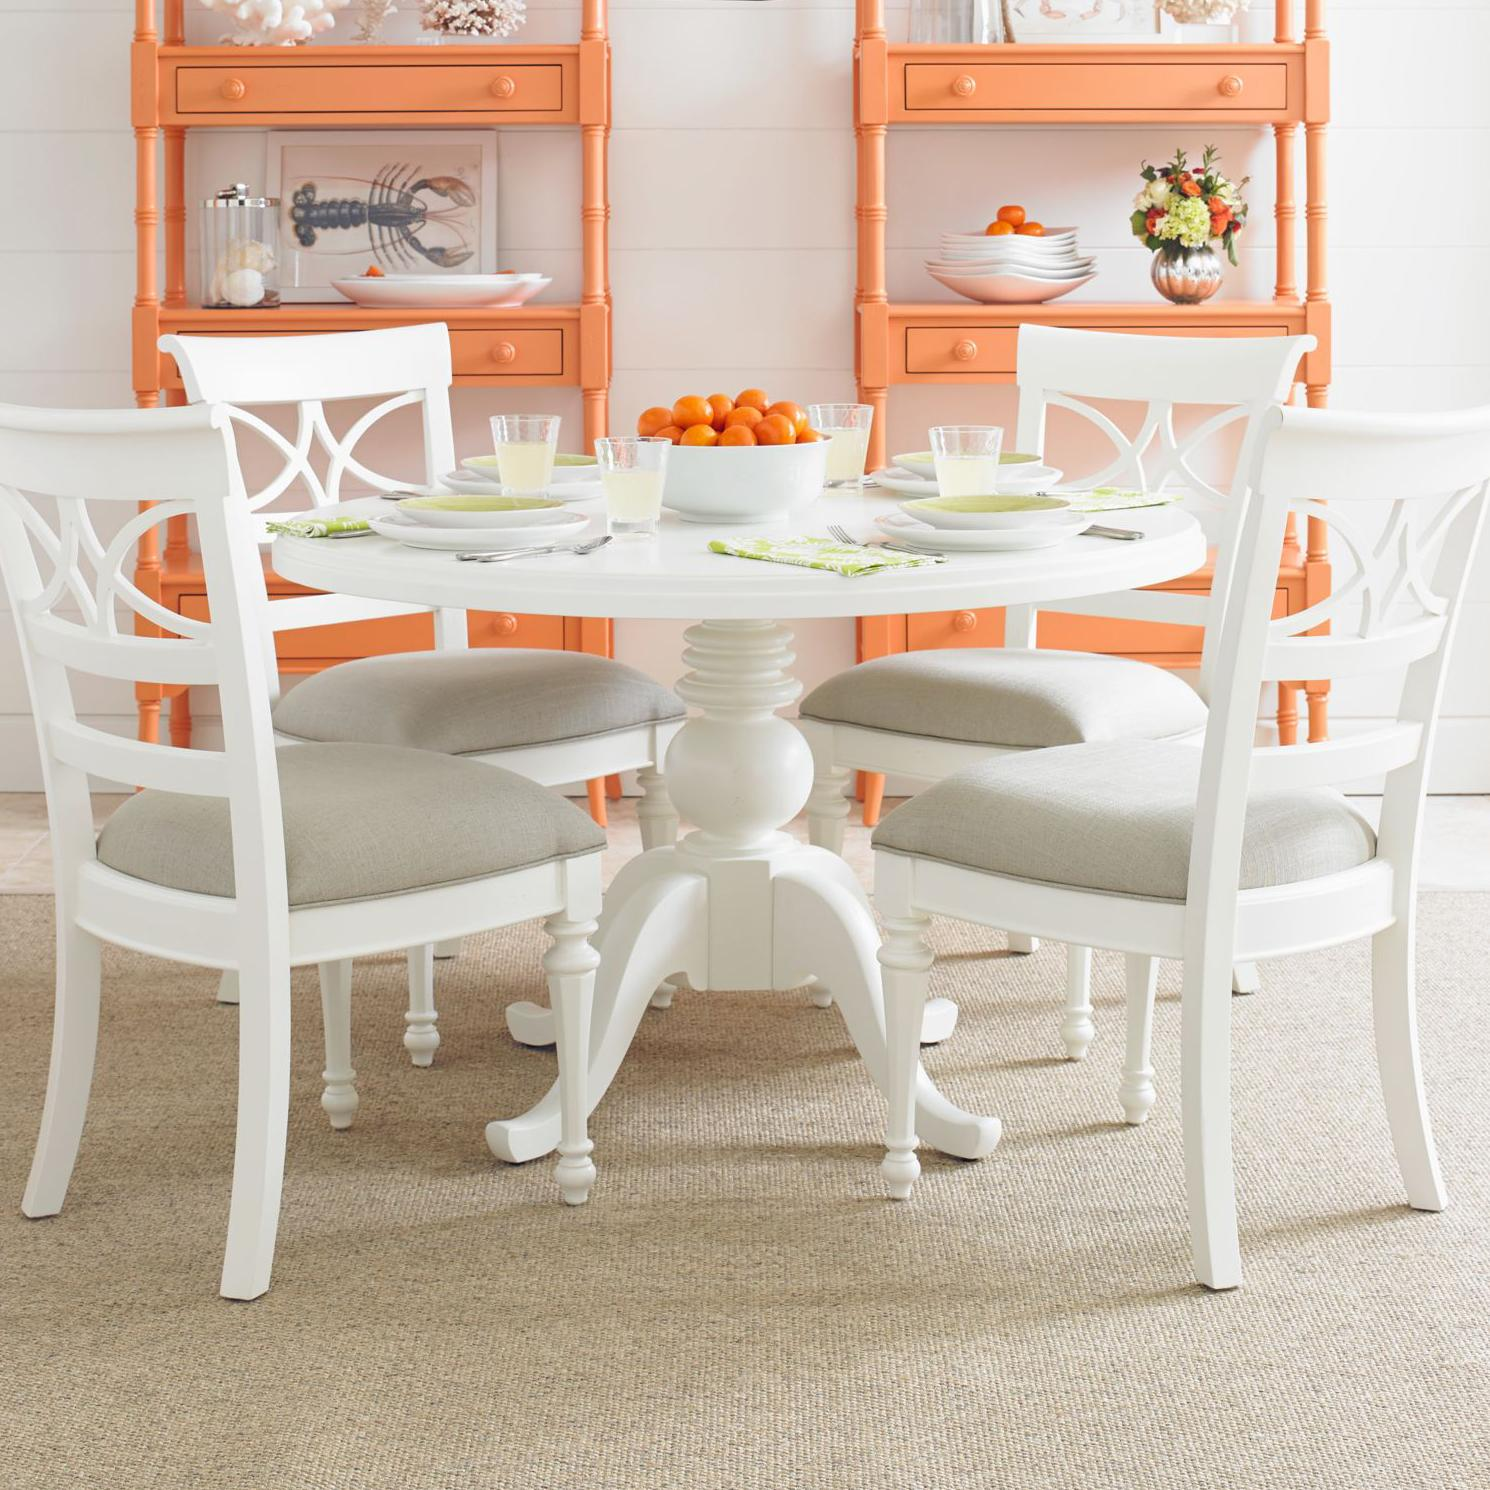 Stanley Furniture Coastal Living Retreat 5-Piece Round Pedestal Table Set - Item Number: 411-21-37+4x60